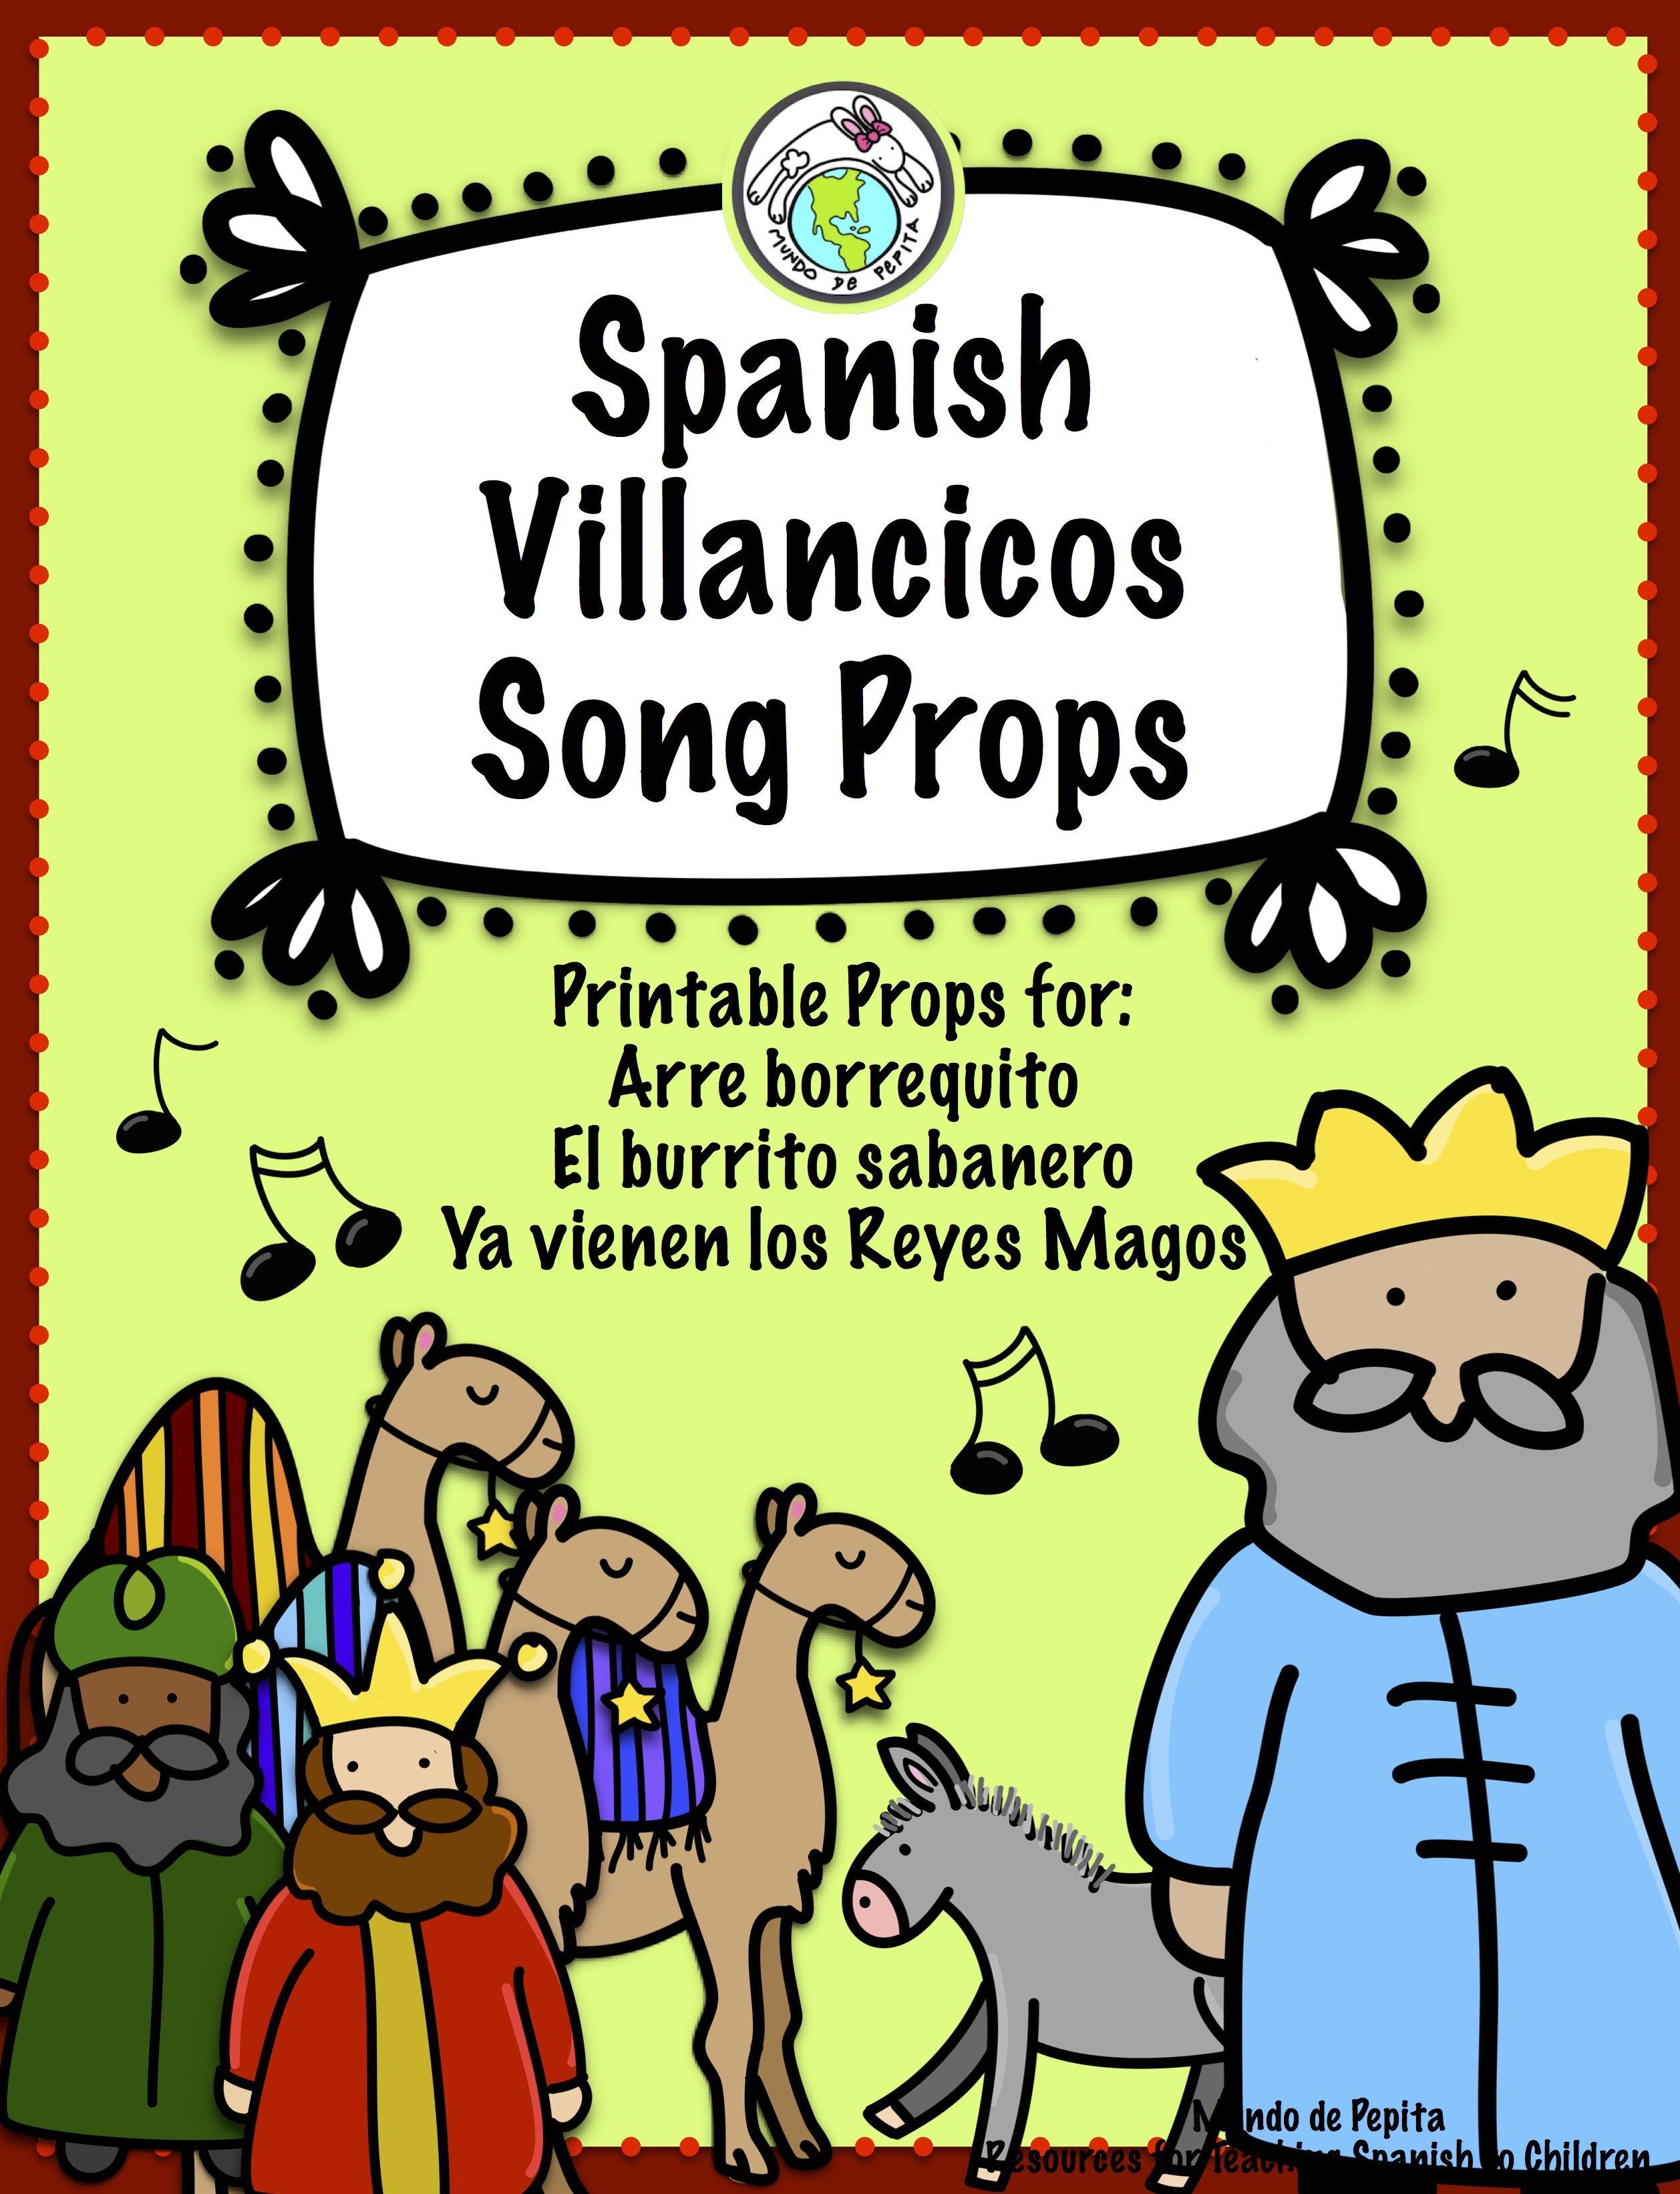 Spanish Christmas Villancicos Printable Song Props With